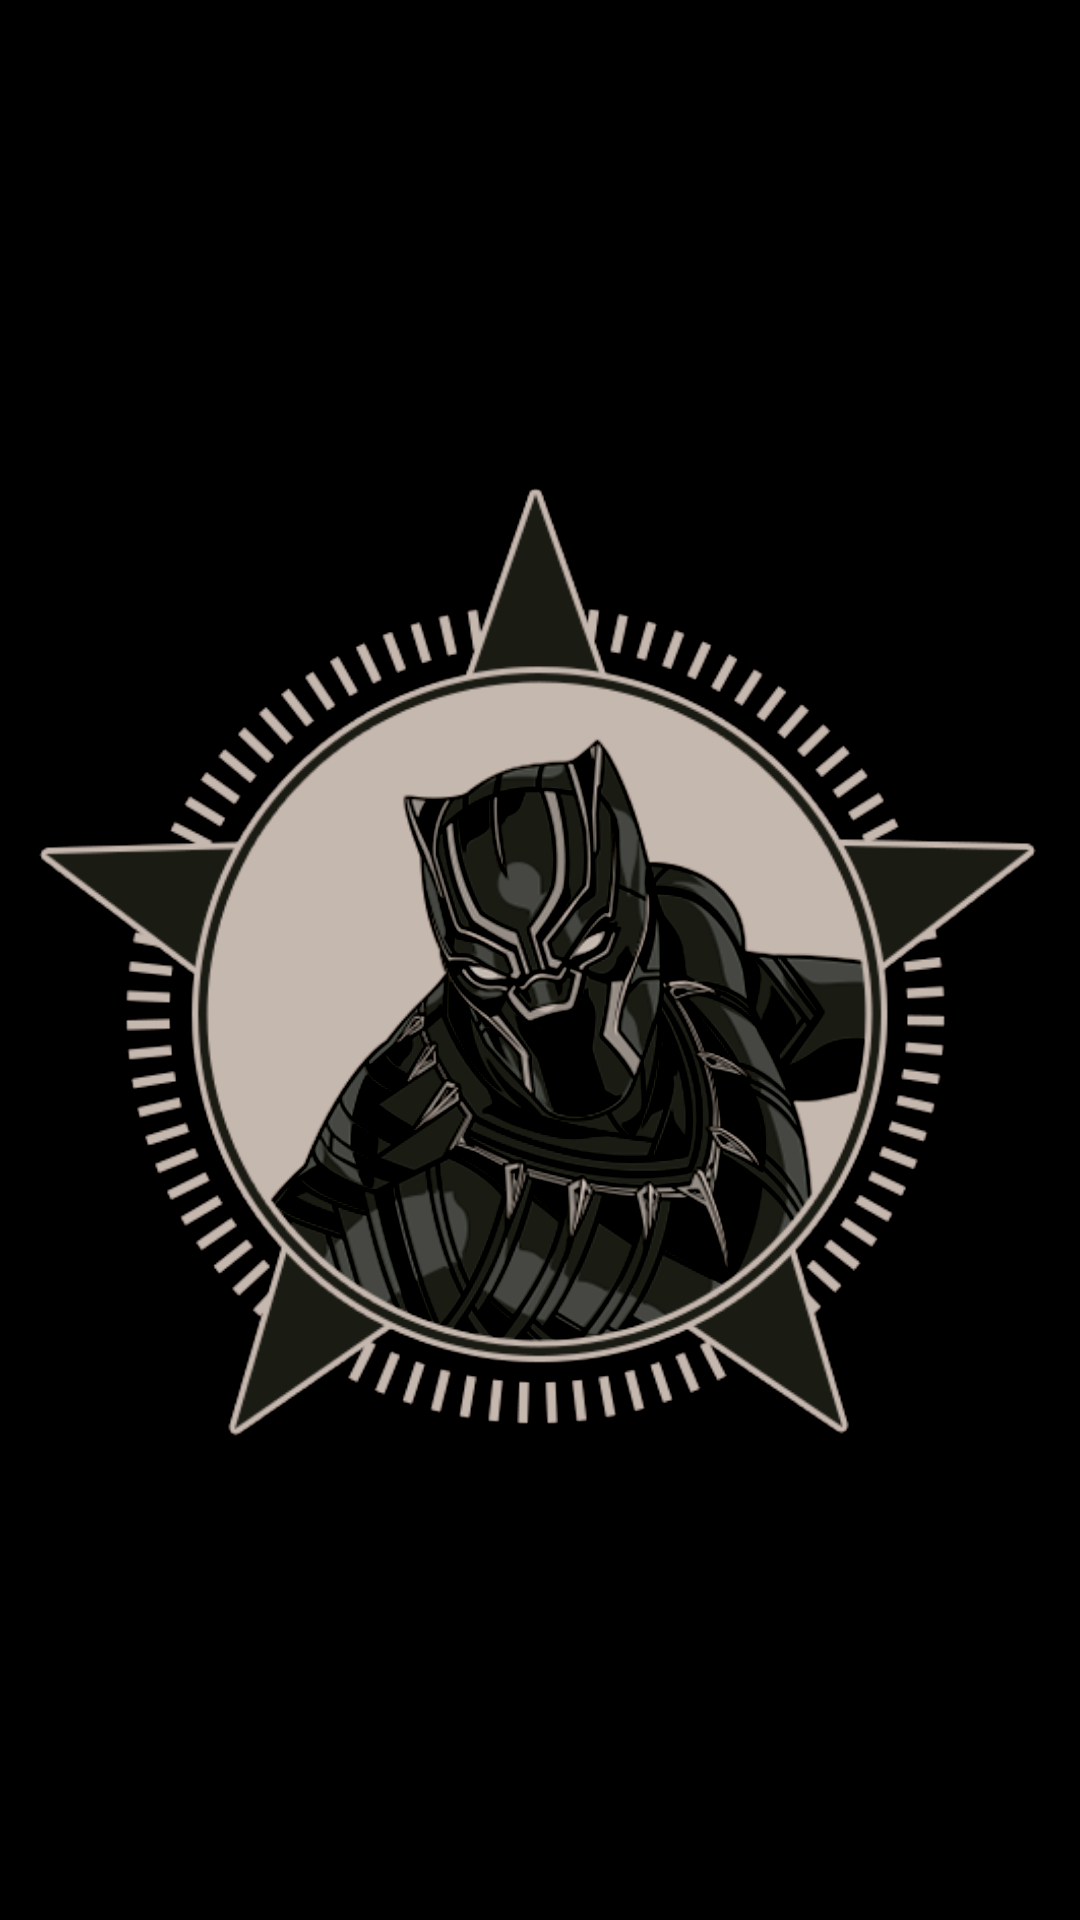 Black Panther Logo Wallpapers Top Free Black Panther Logo Backgrounds Wallpaperaccess